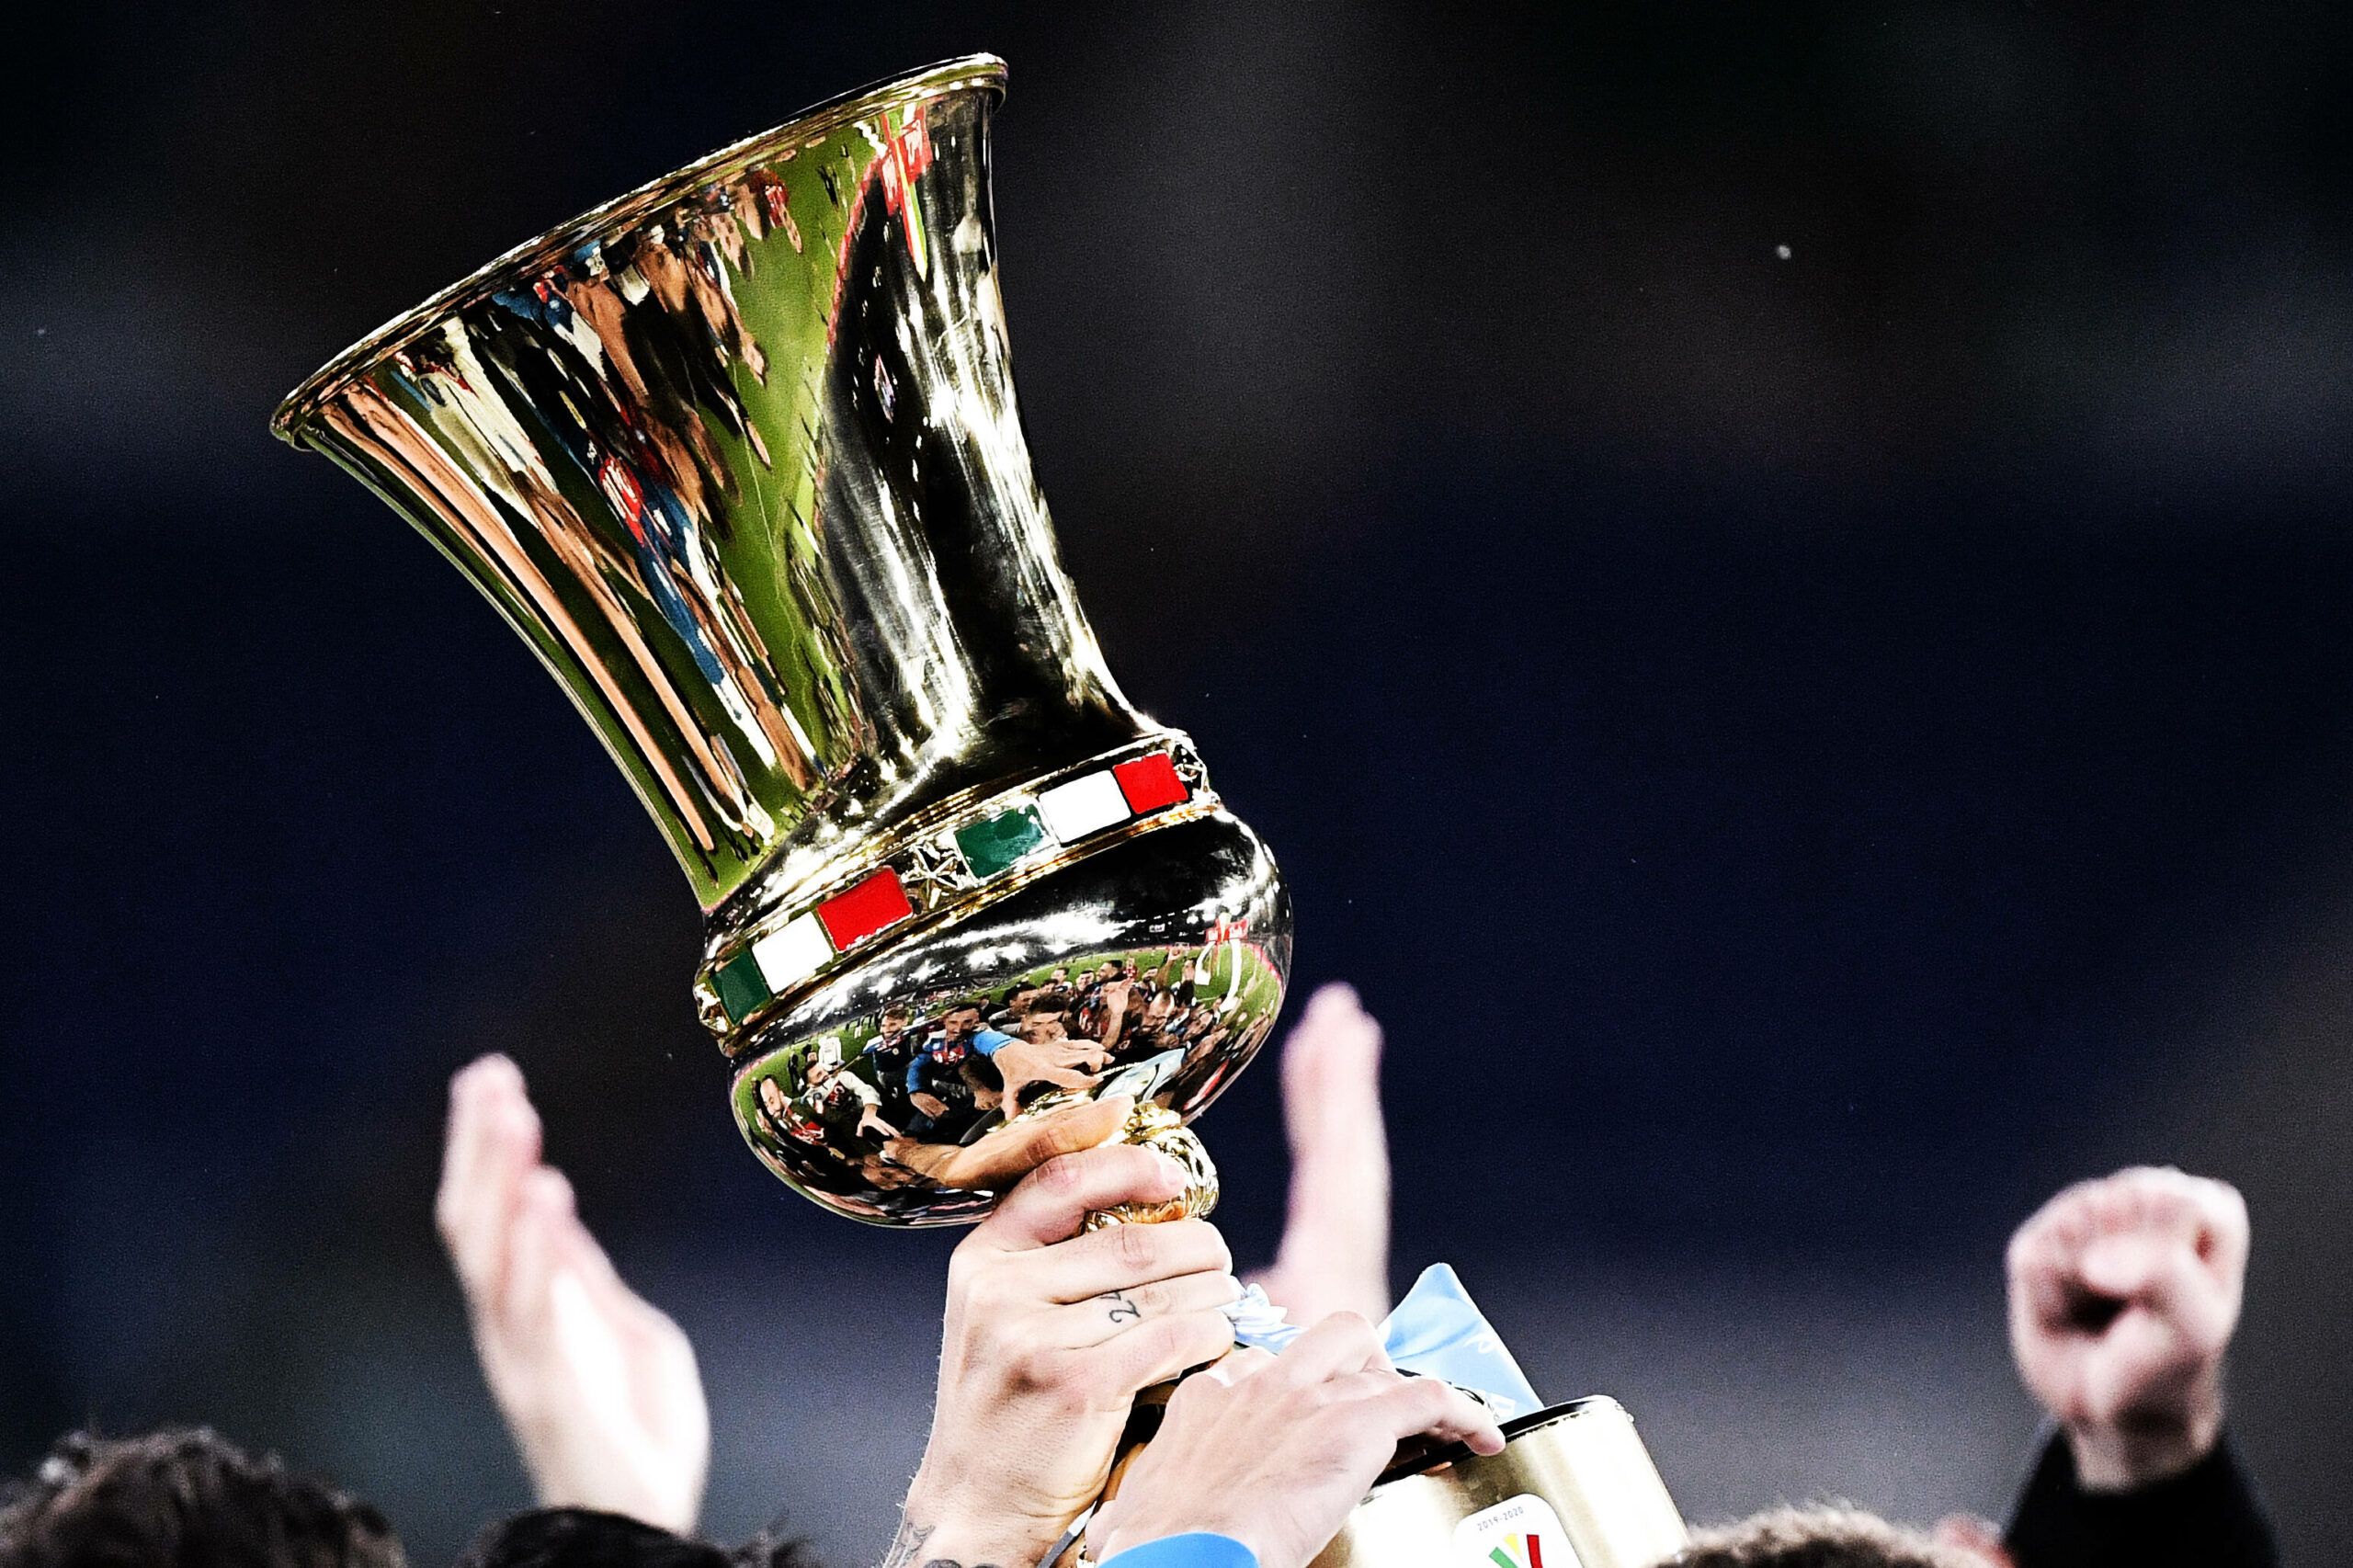 Coppa Italia Reform